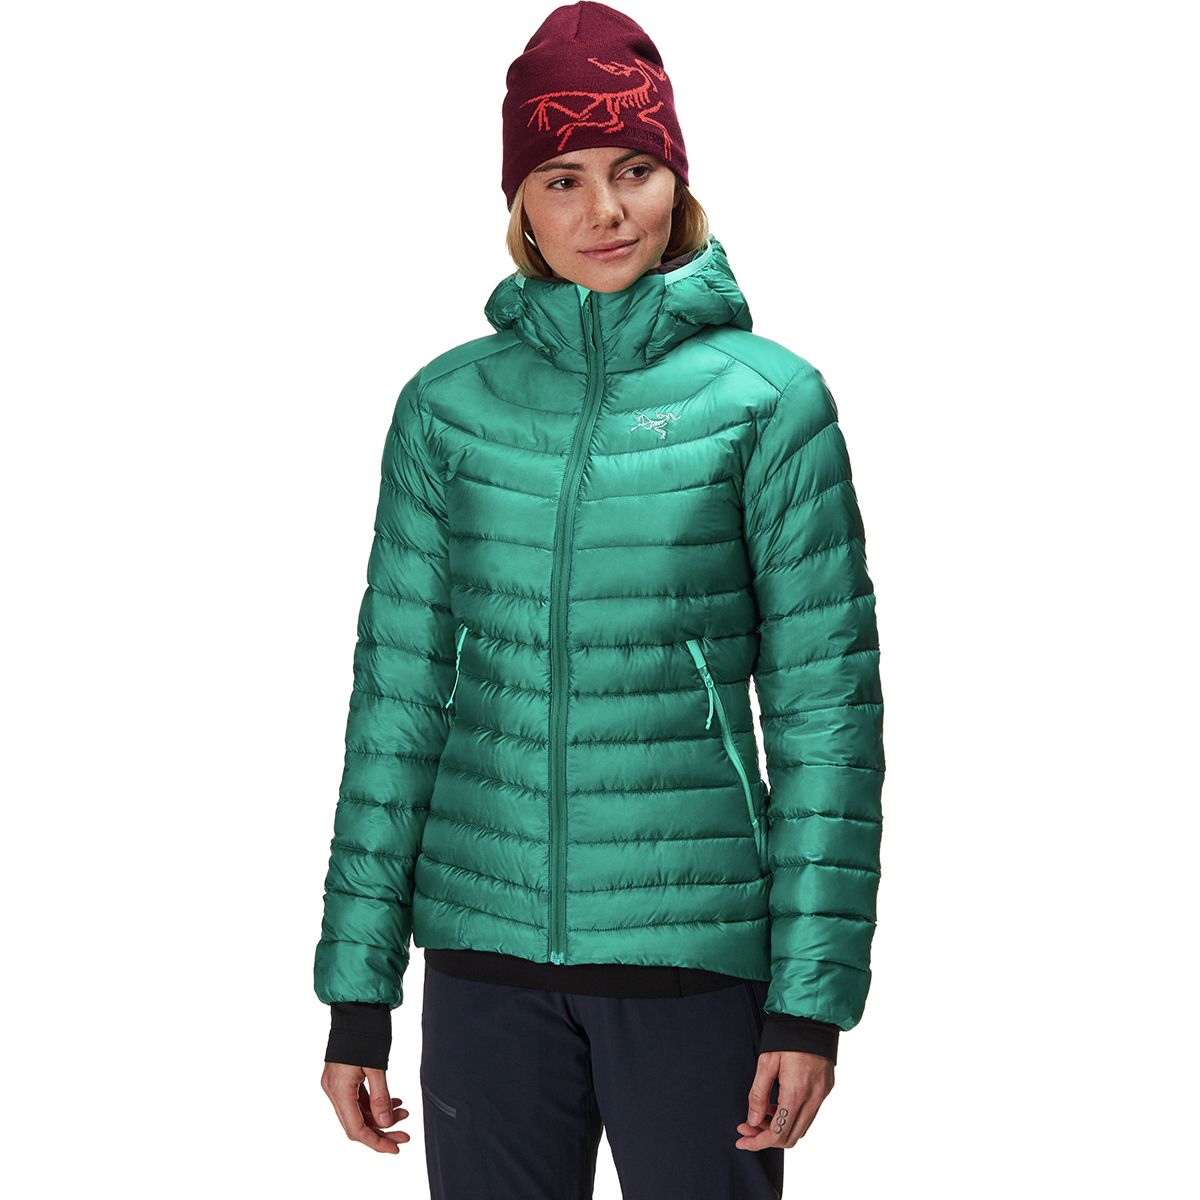 Cerium LT Hooded Down Jacket - Women